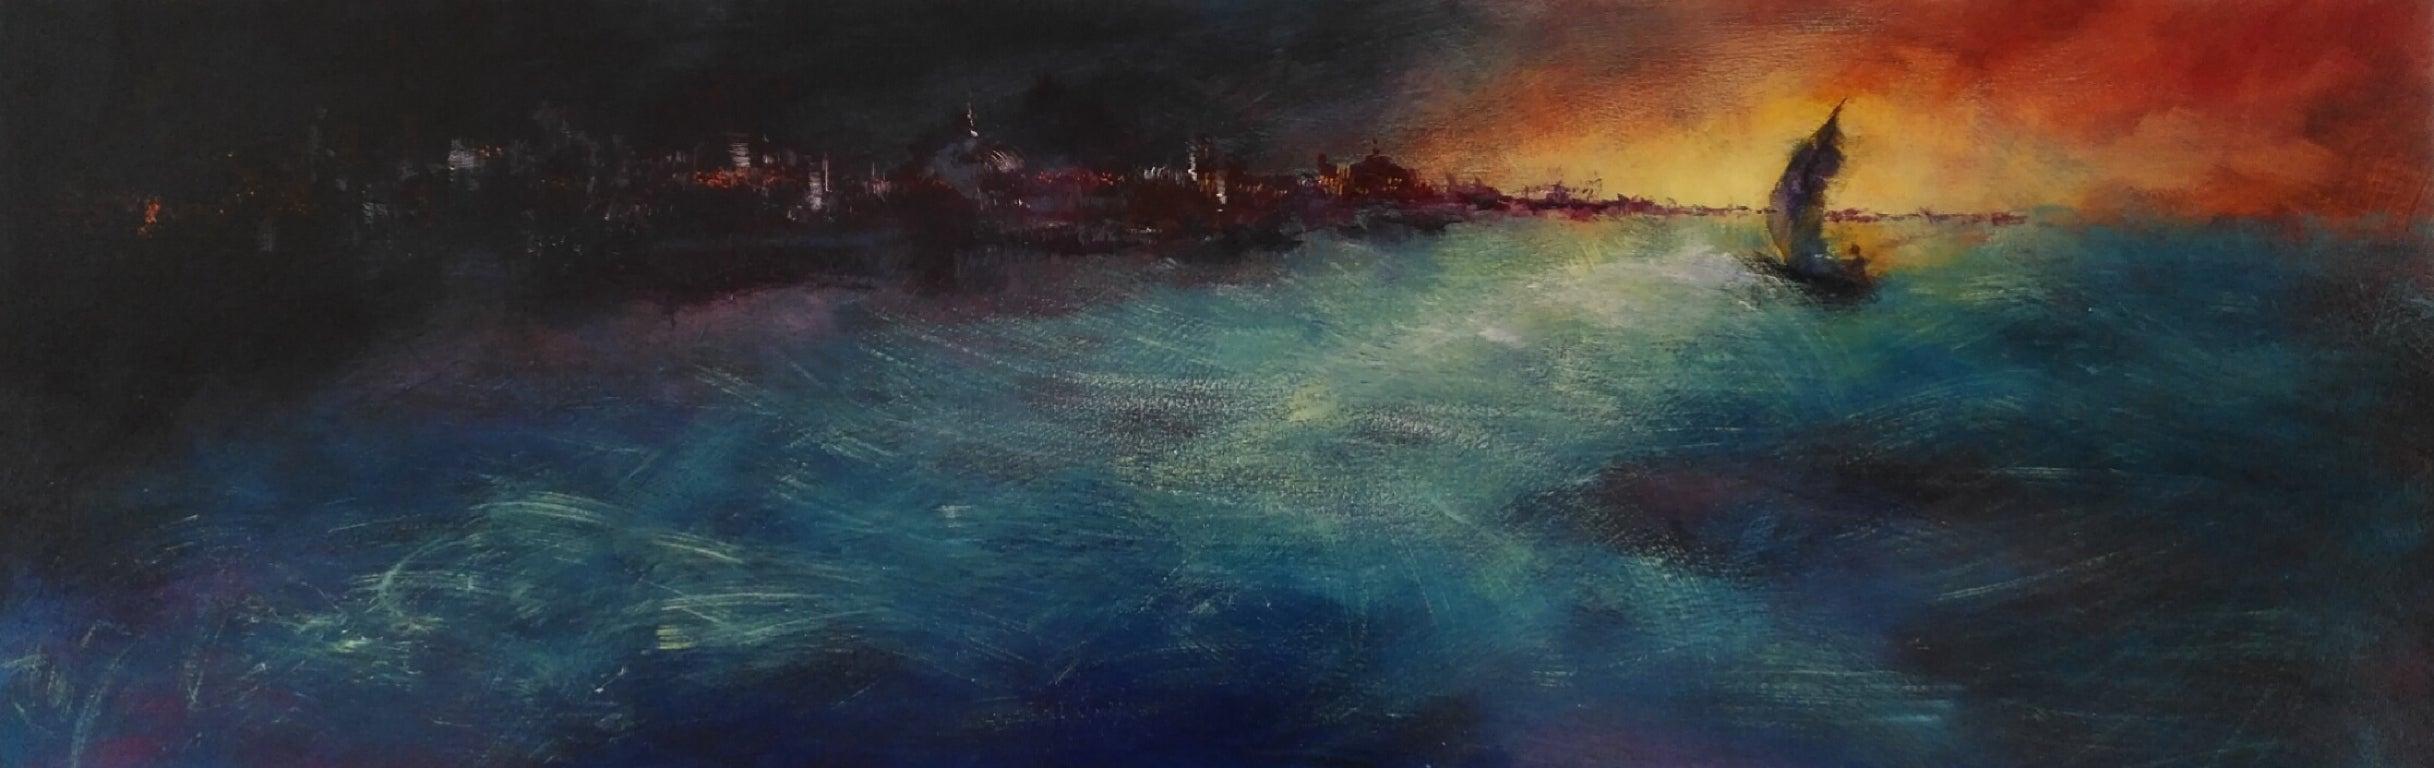 De Tornada - 21st Century, Contemporary, Seascape Painting, Oil on Canvas